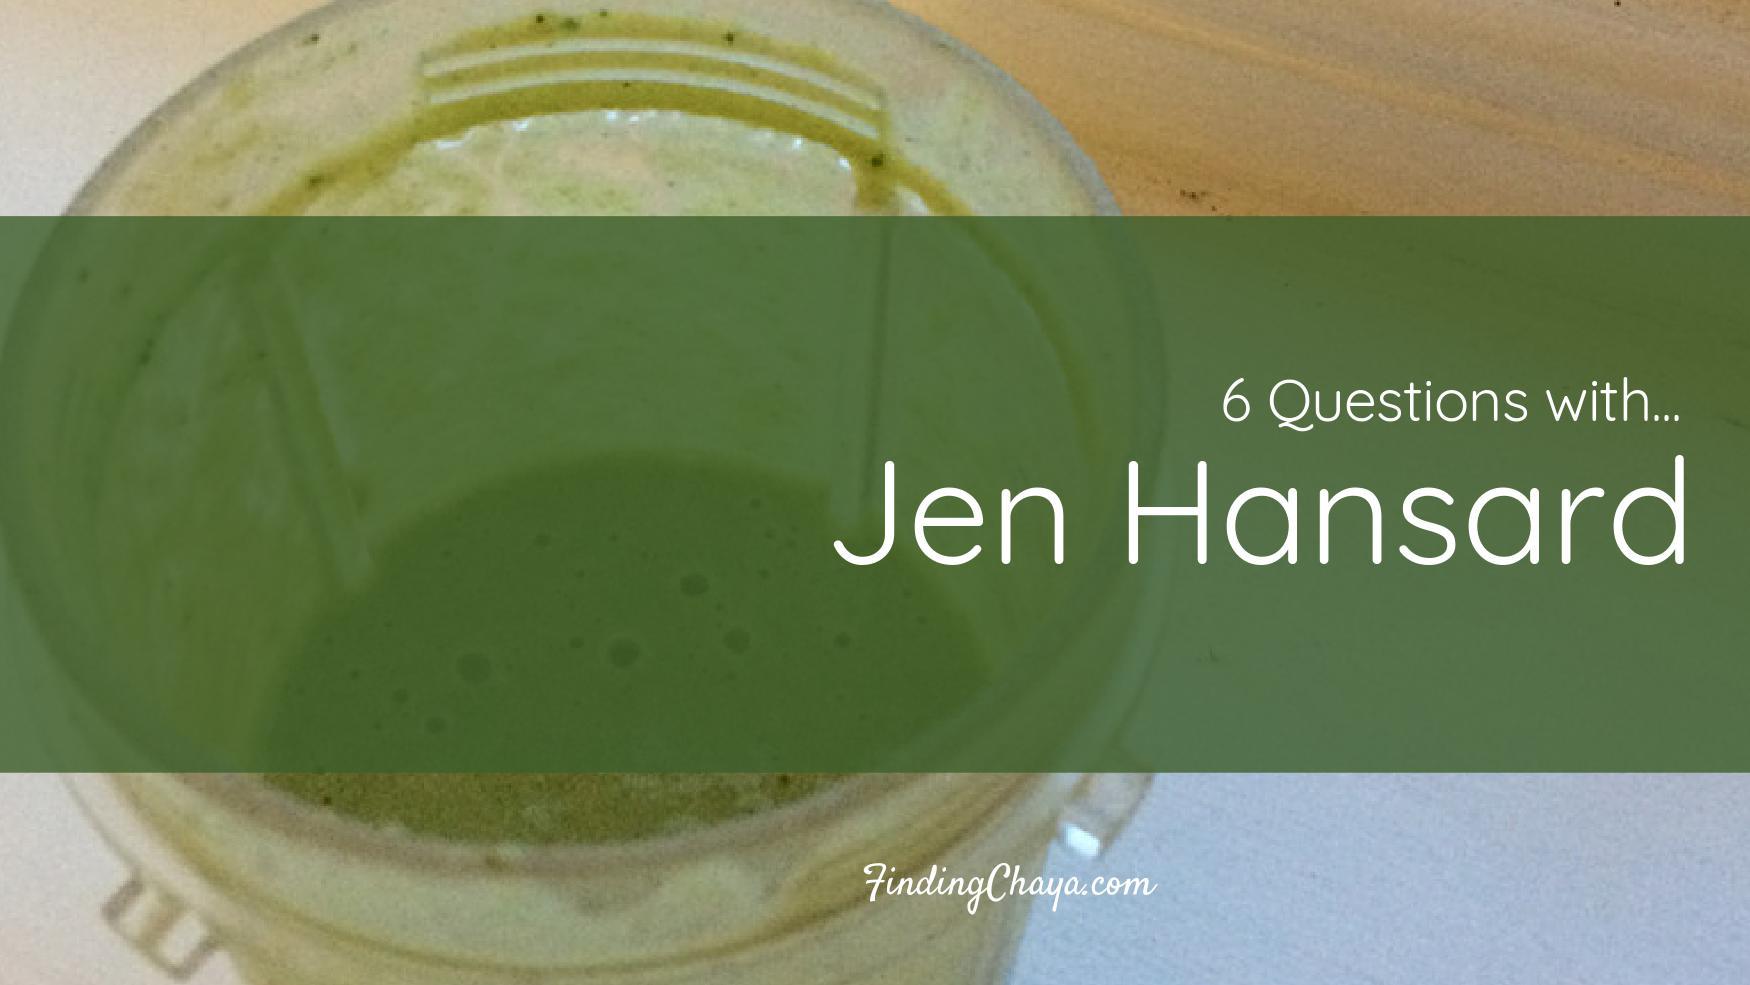 6 Questions with Jen Hansard